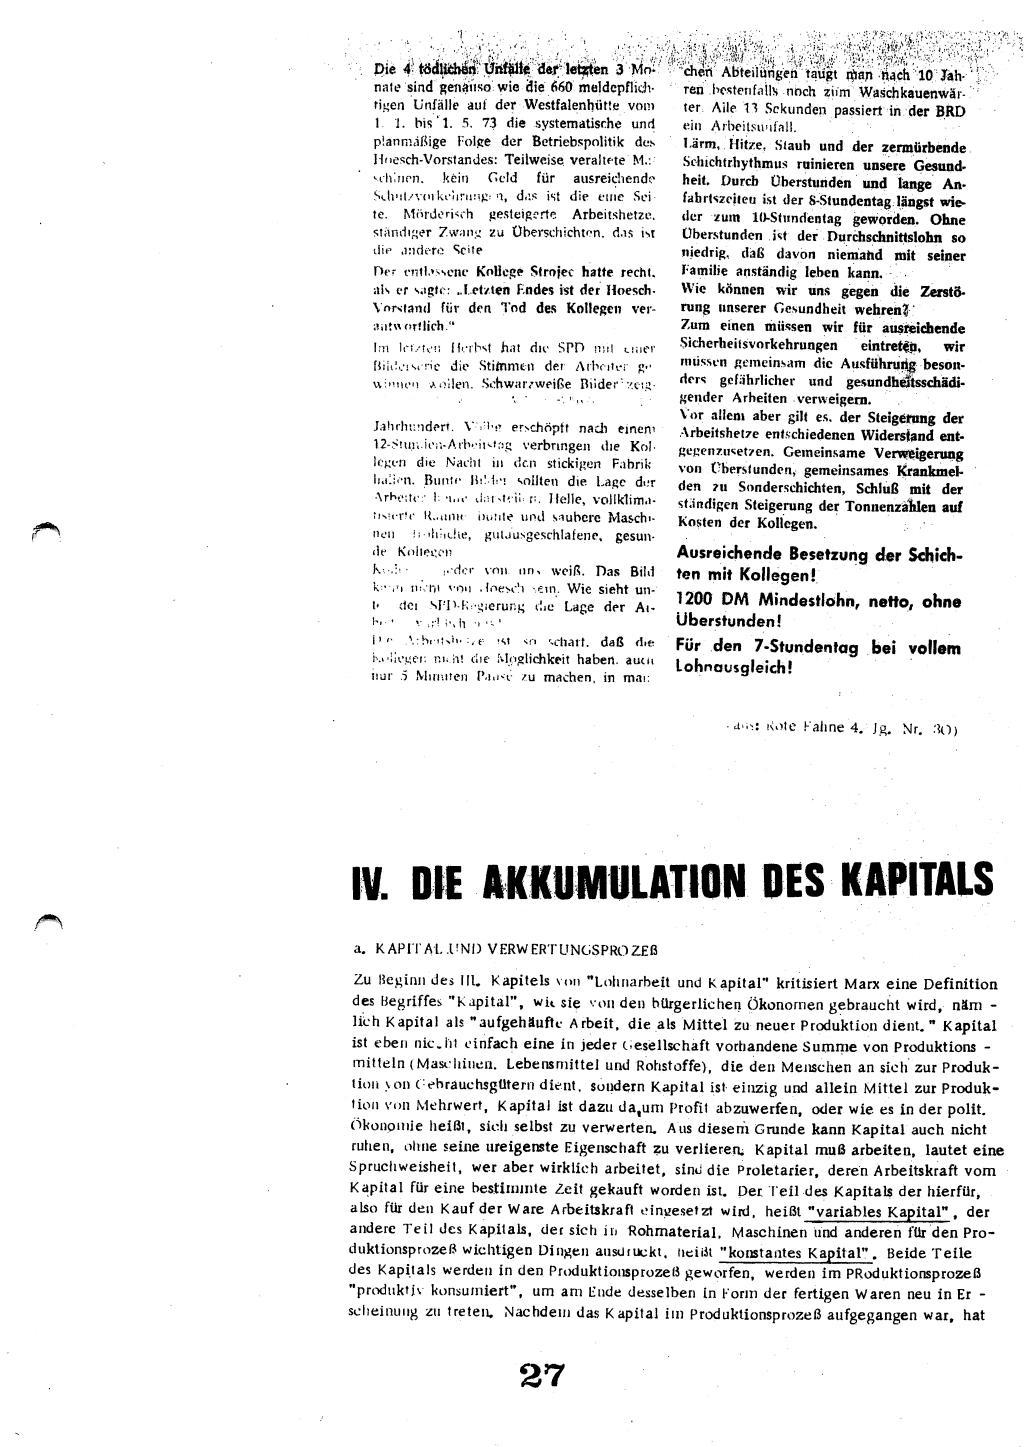 KSV_Grundschulung_1975_01_46